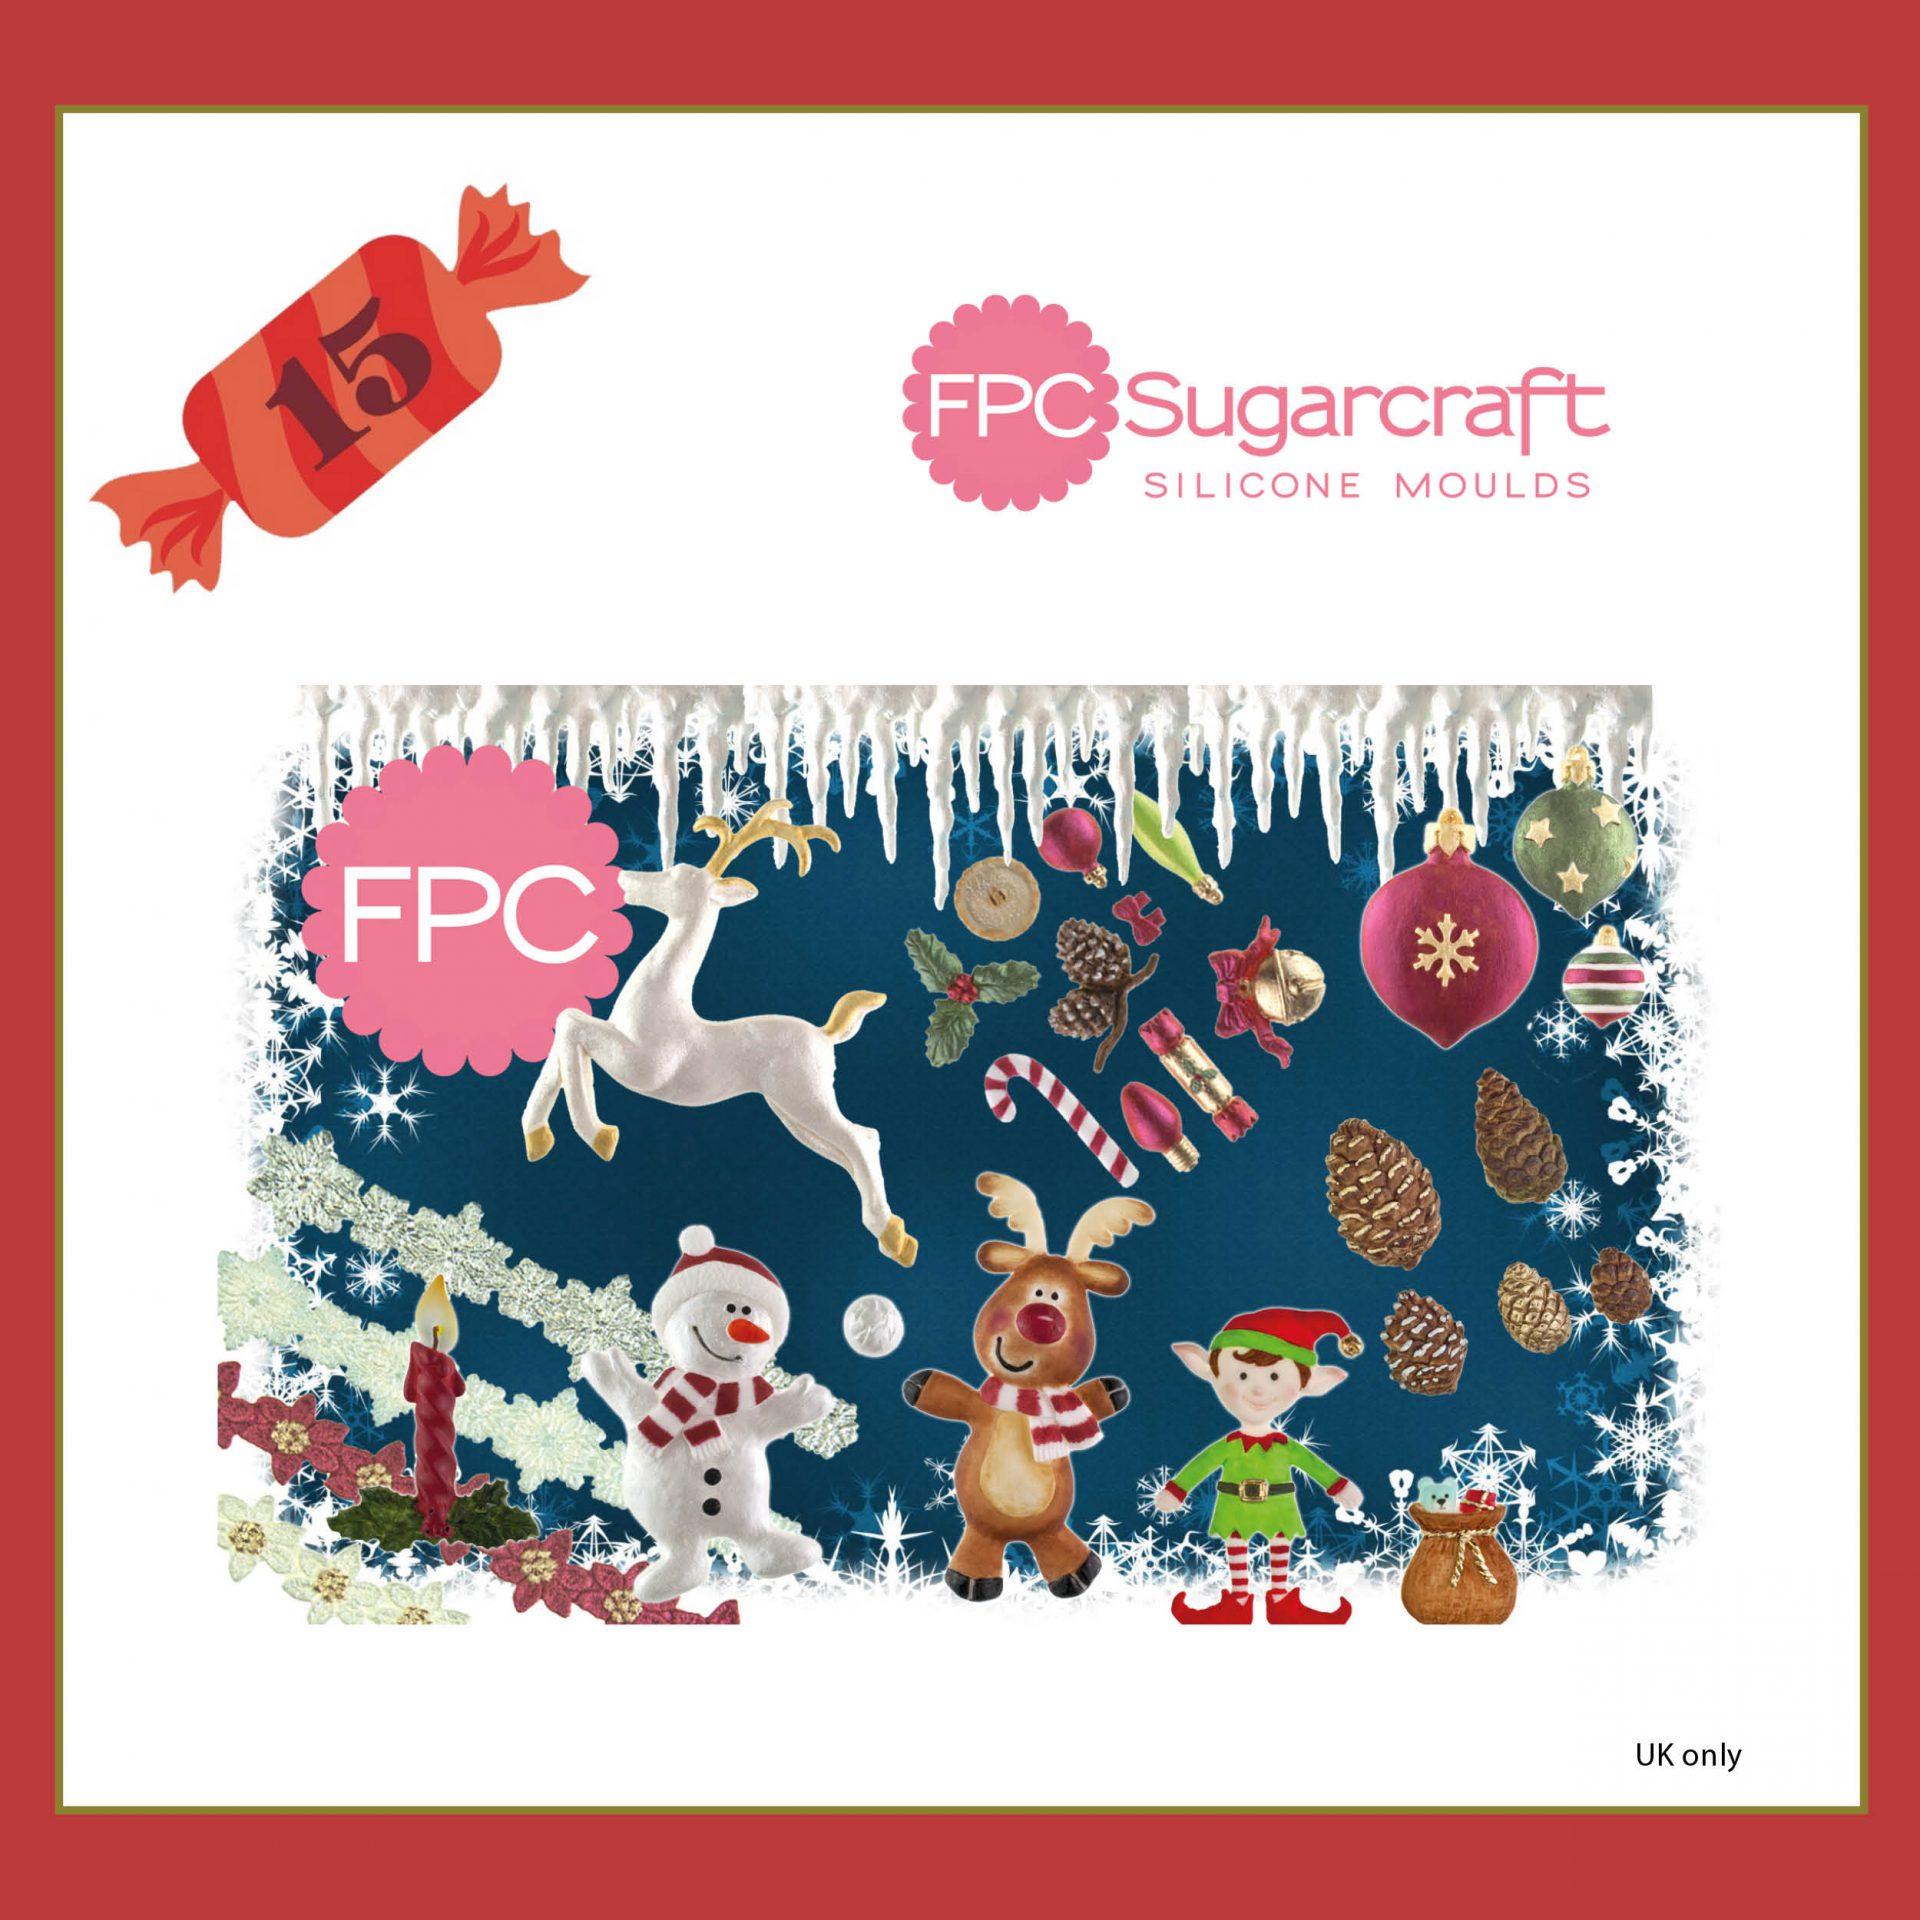 15th-december-fpc-sugarcraft